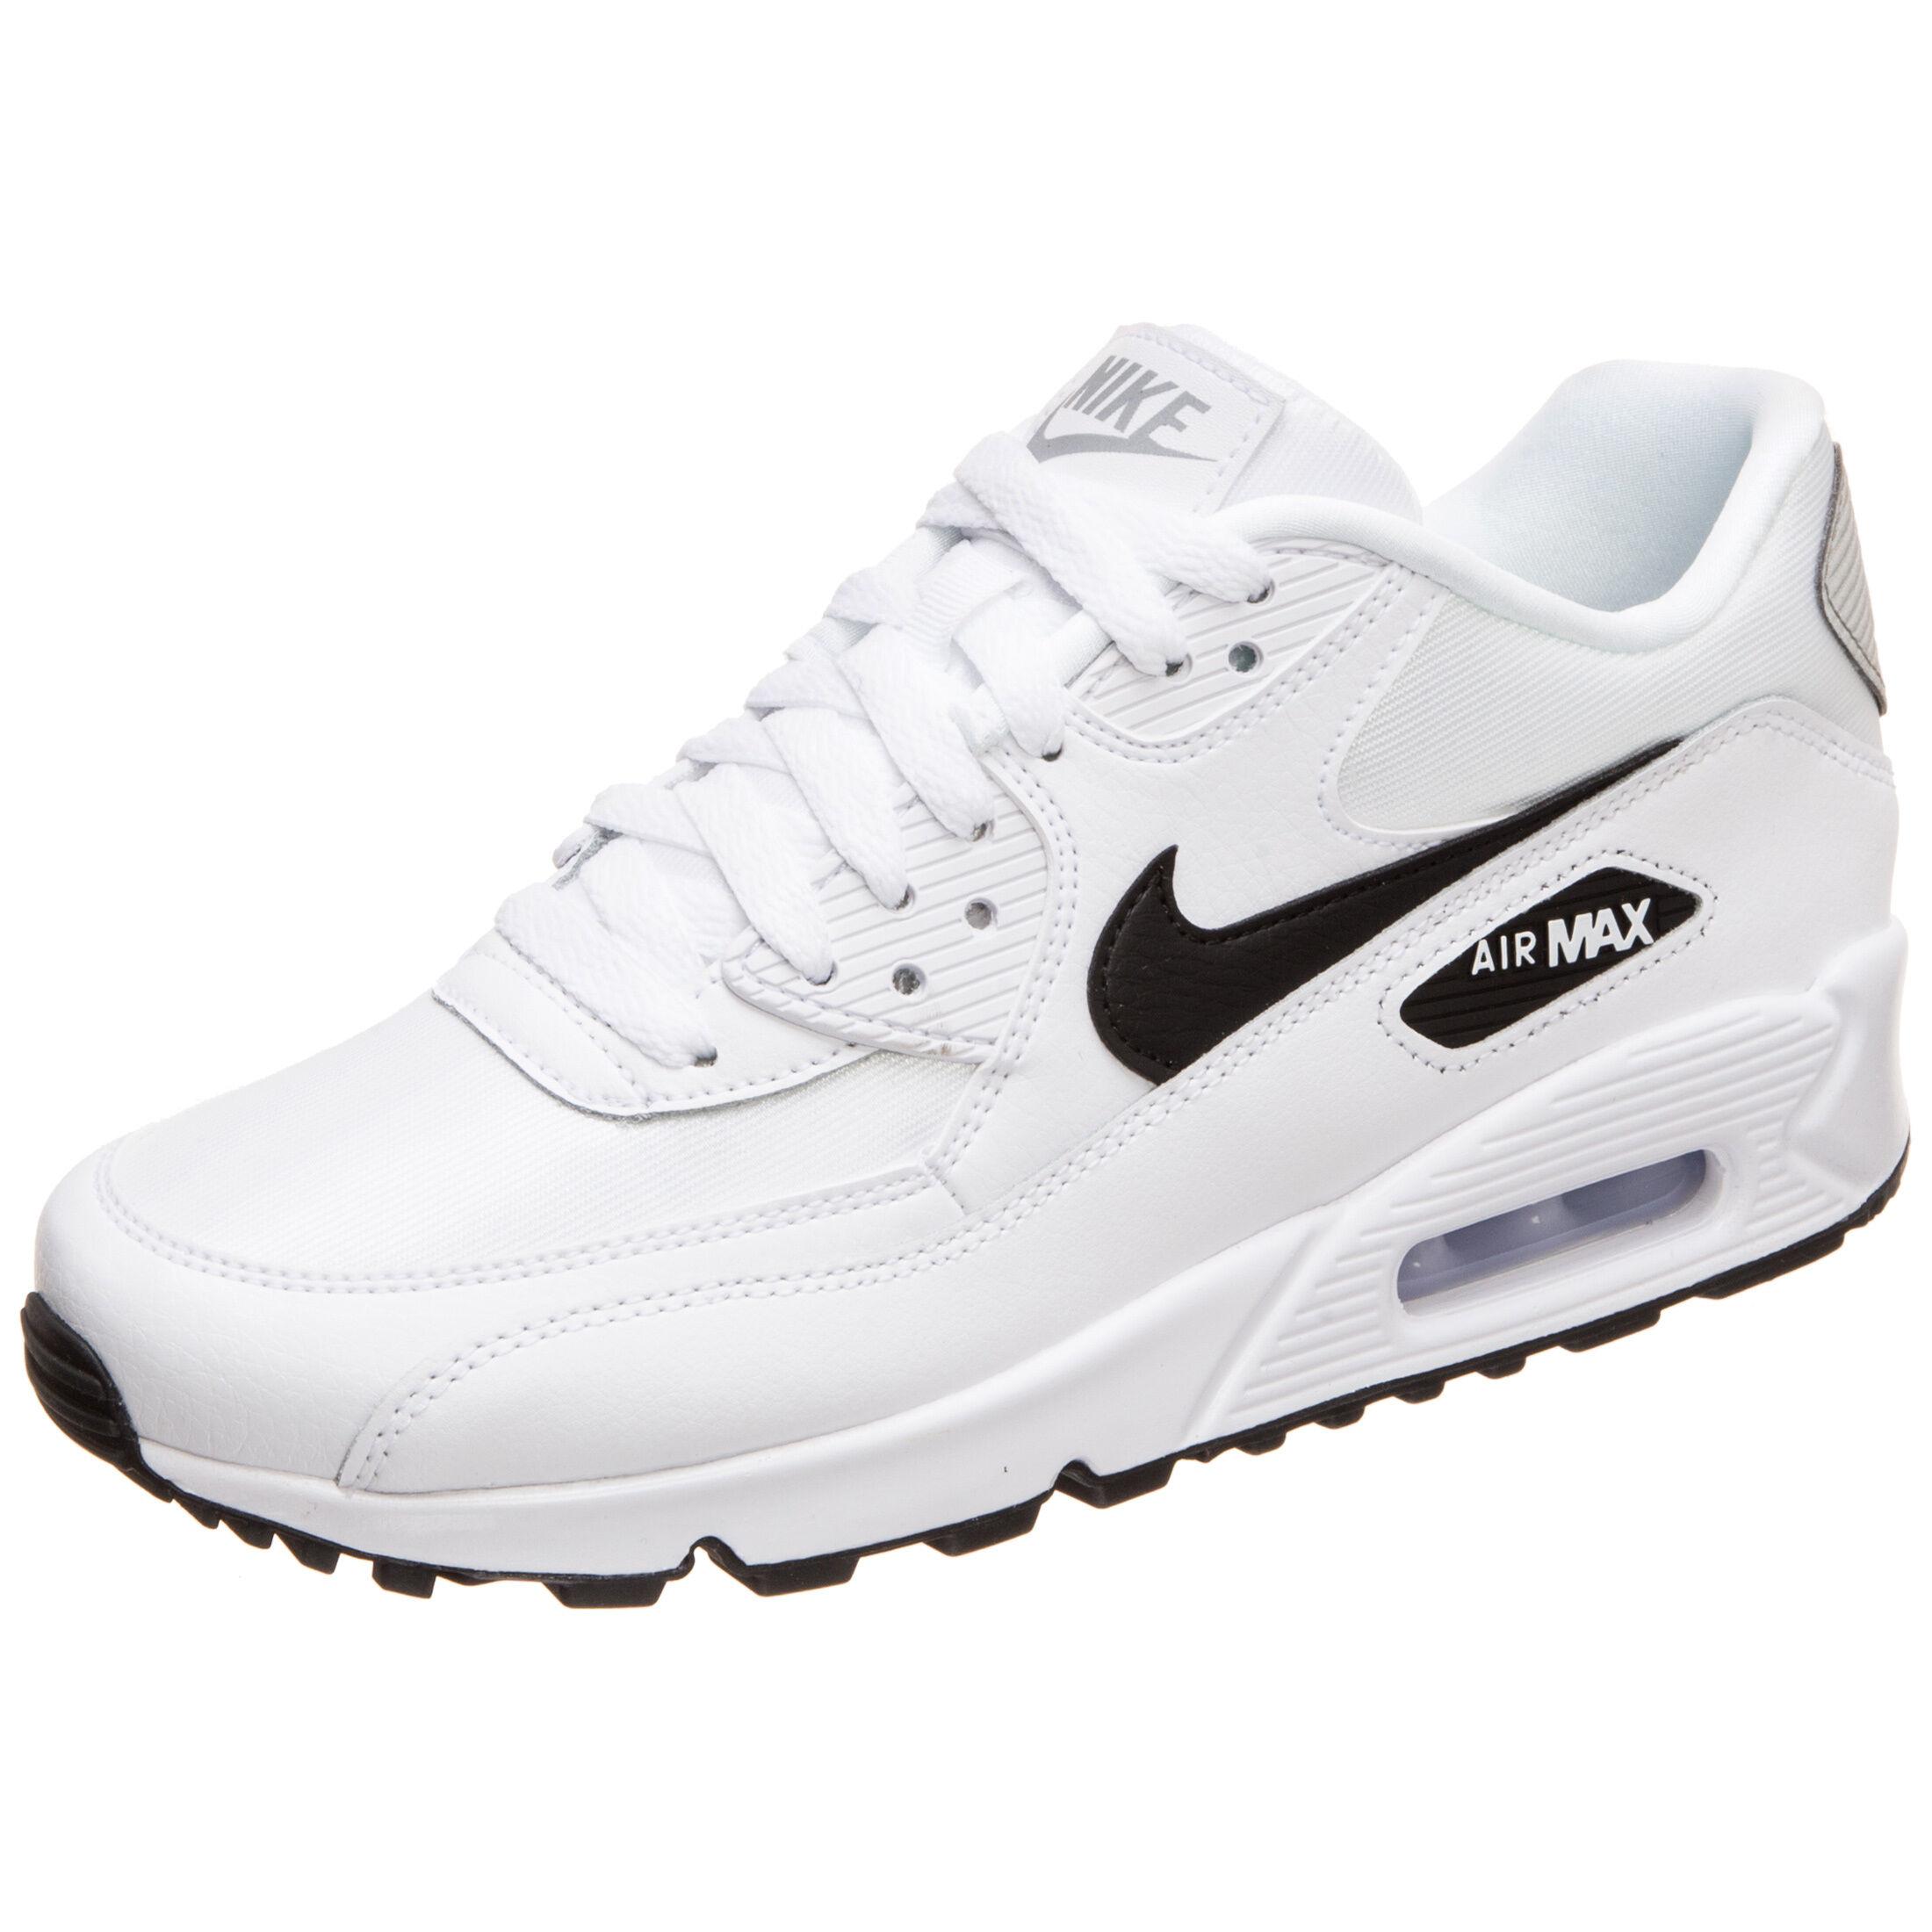 low priced 462c3 dd40e ... australia air max 90 sneaker damen weiß schwarz zoom bei outfitter  online. neu. nike ...